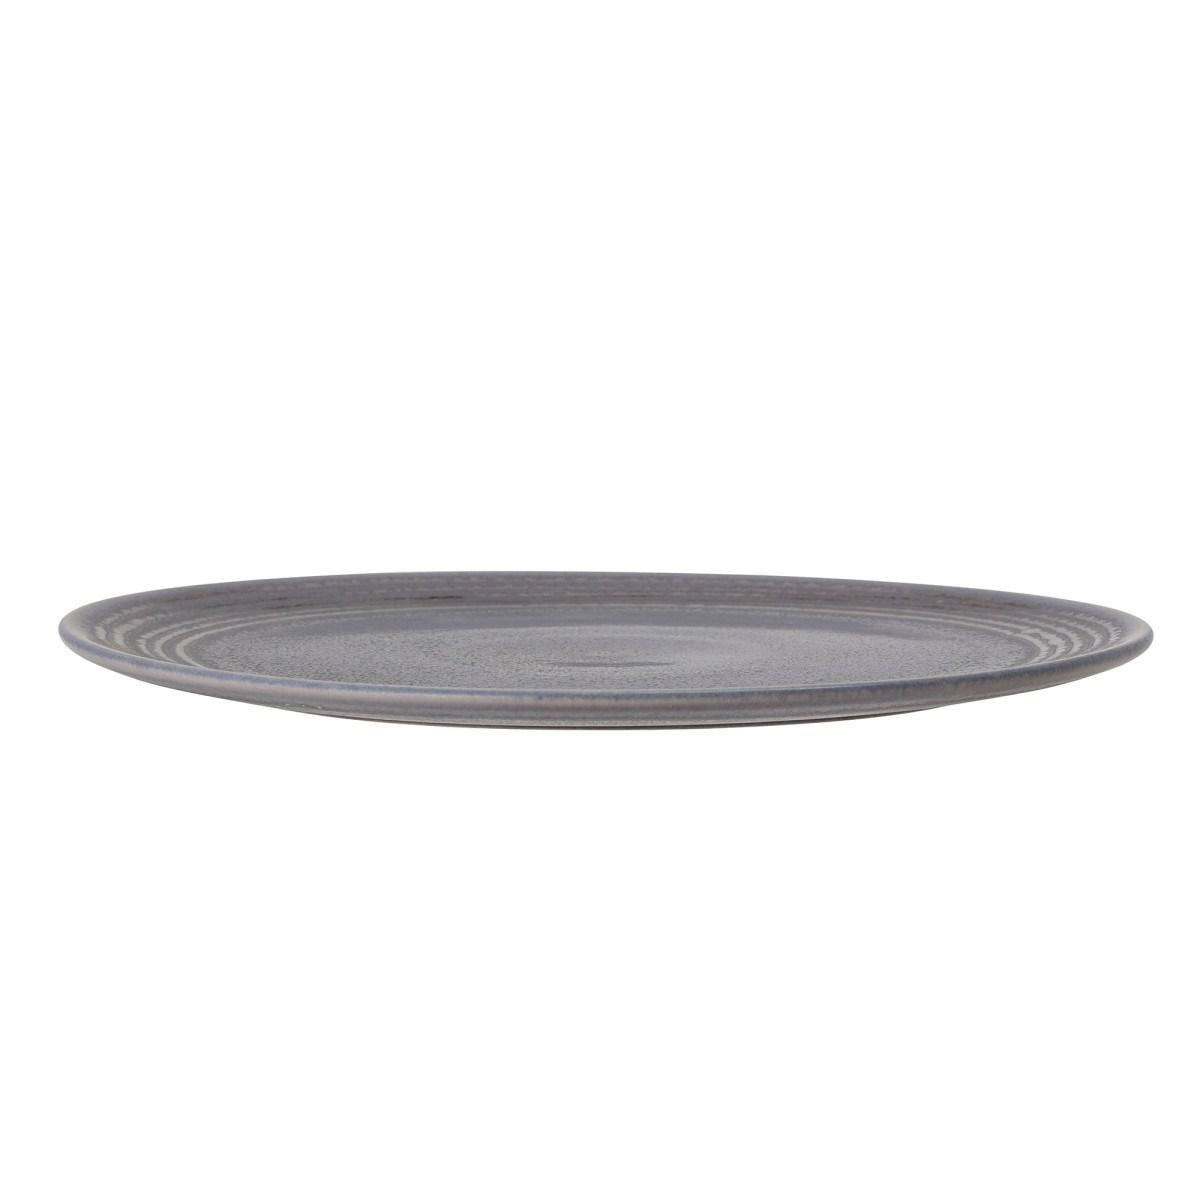 Talíř Raben 30 cm šedý kameninový_0